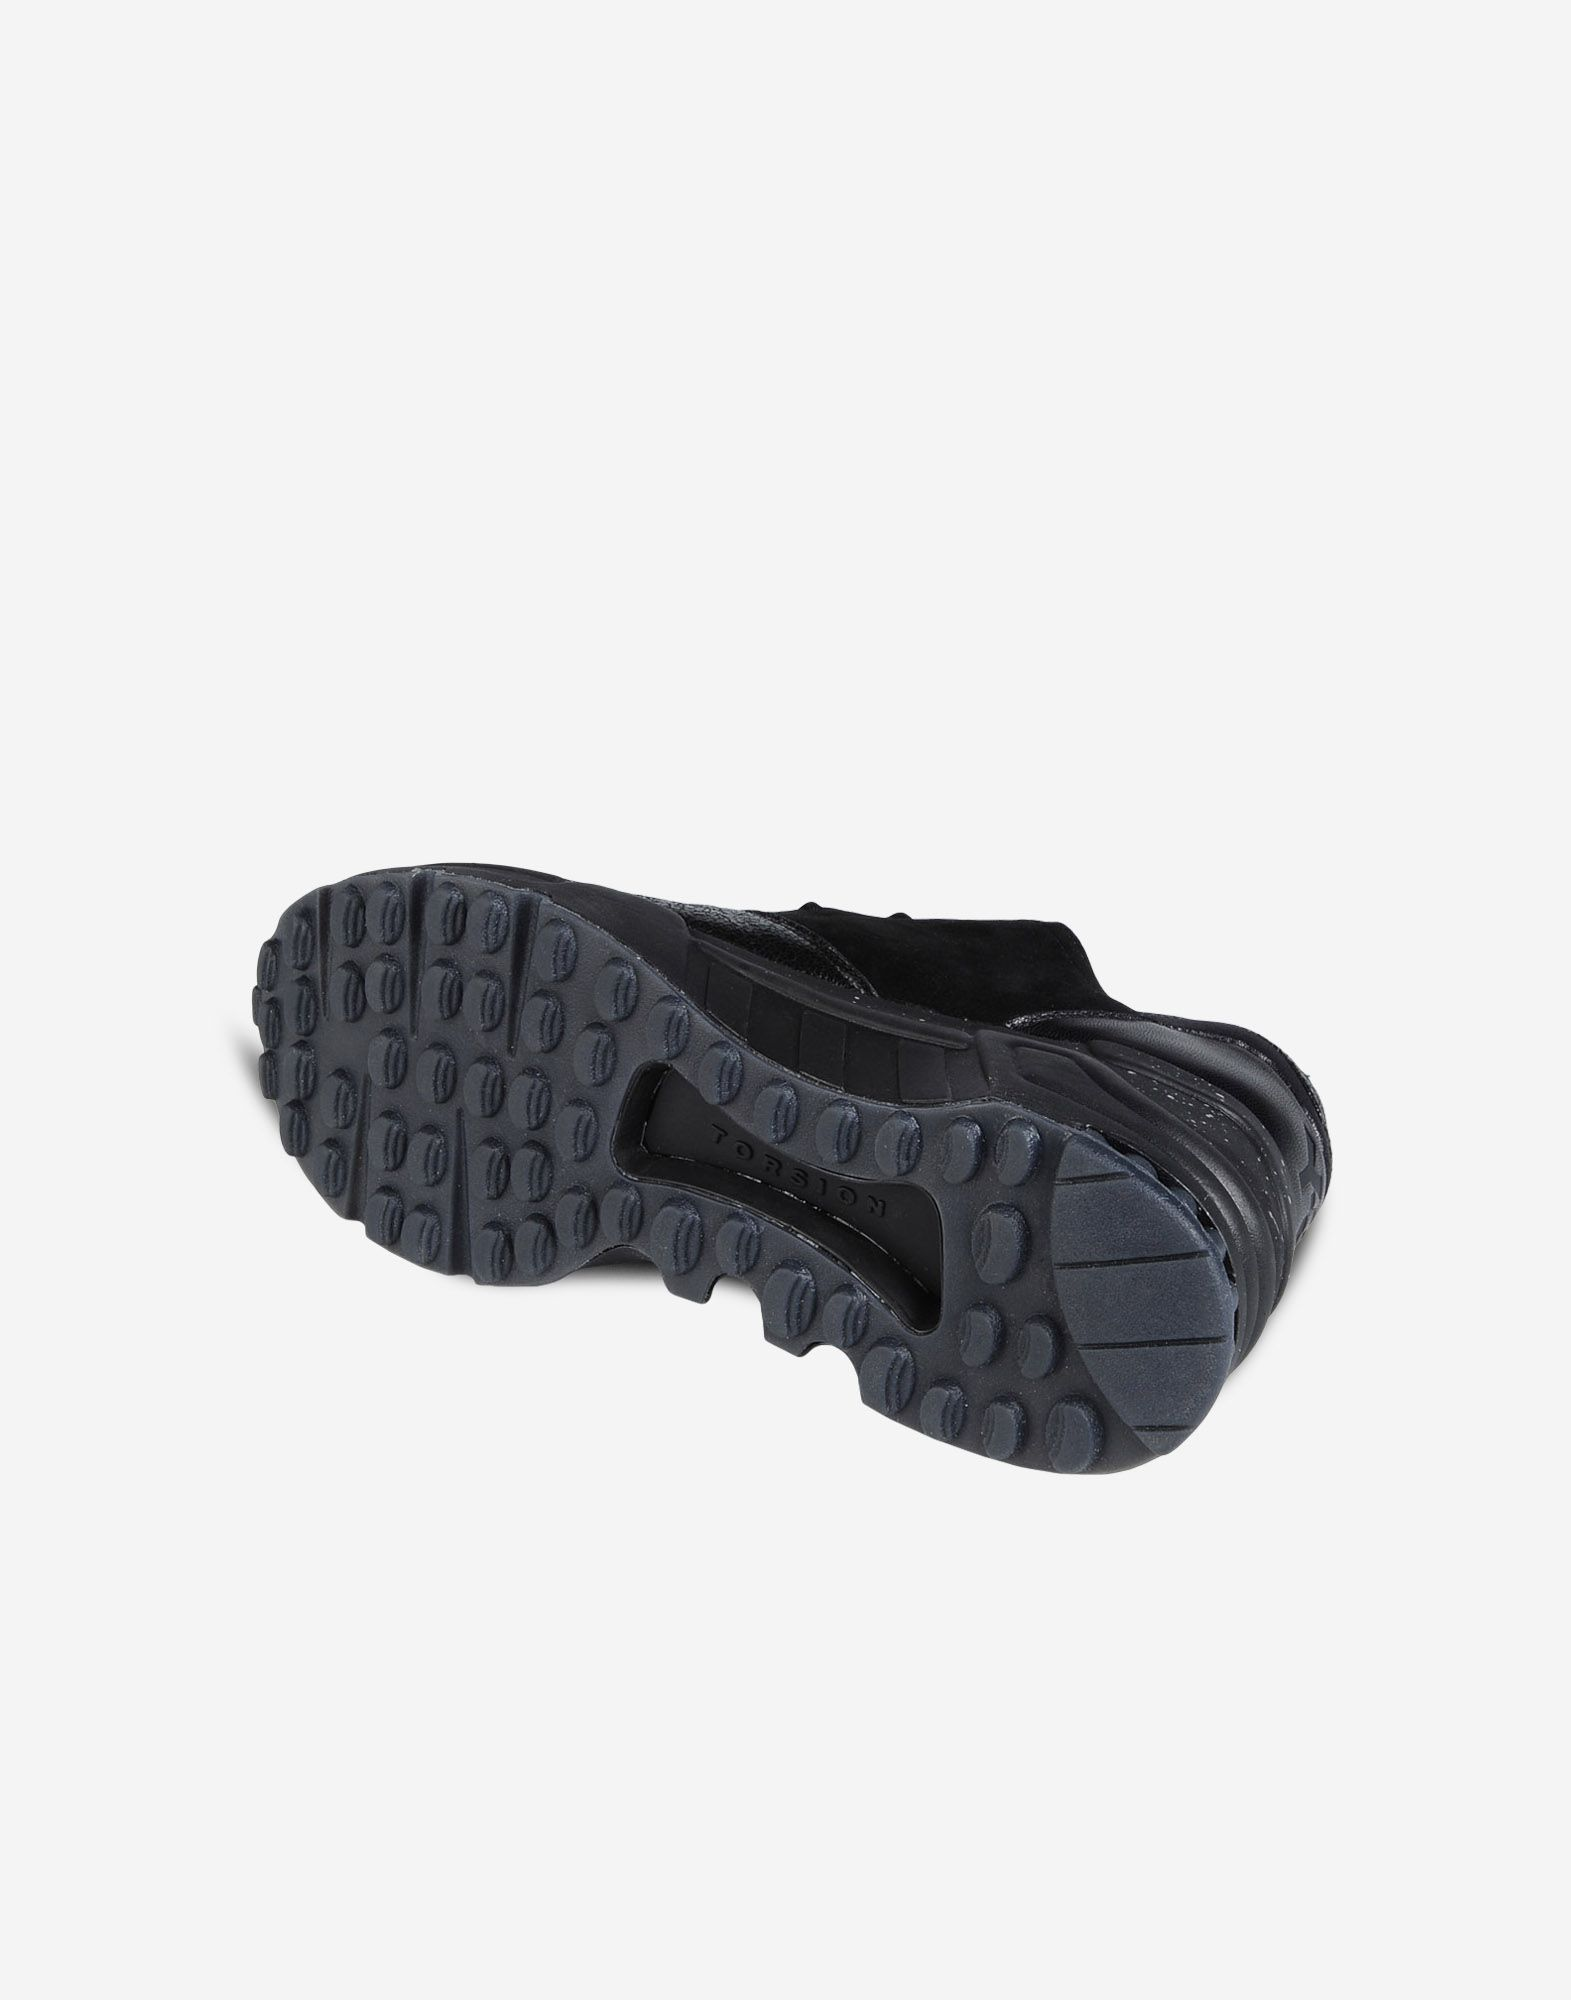 new style abd74 15304 Y-3 Y-3 WEDGE SOCK RUN Sneakers Woman e ...